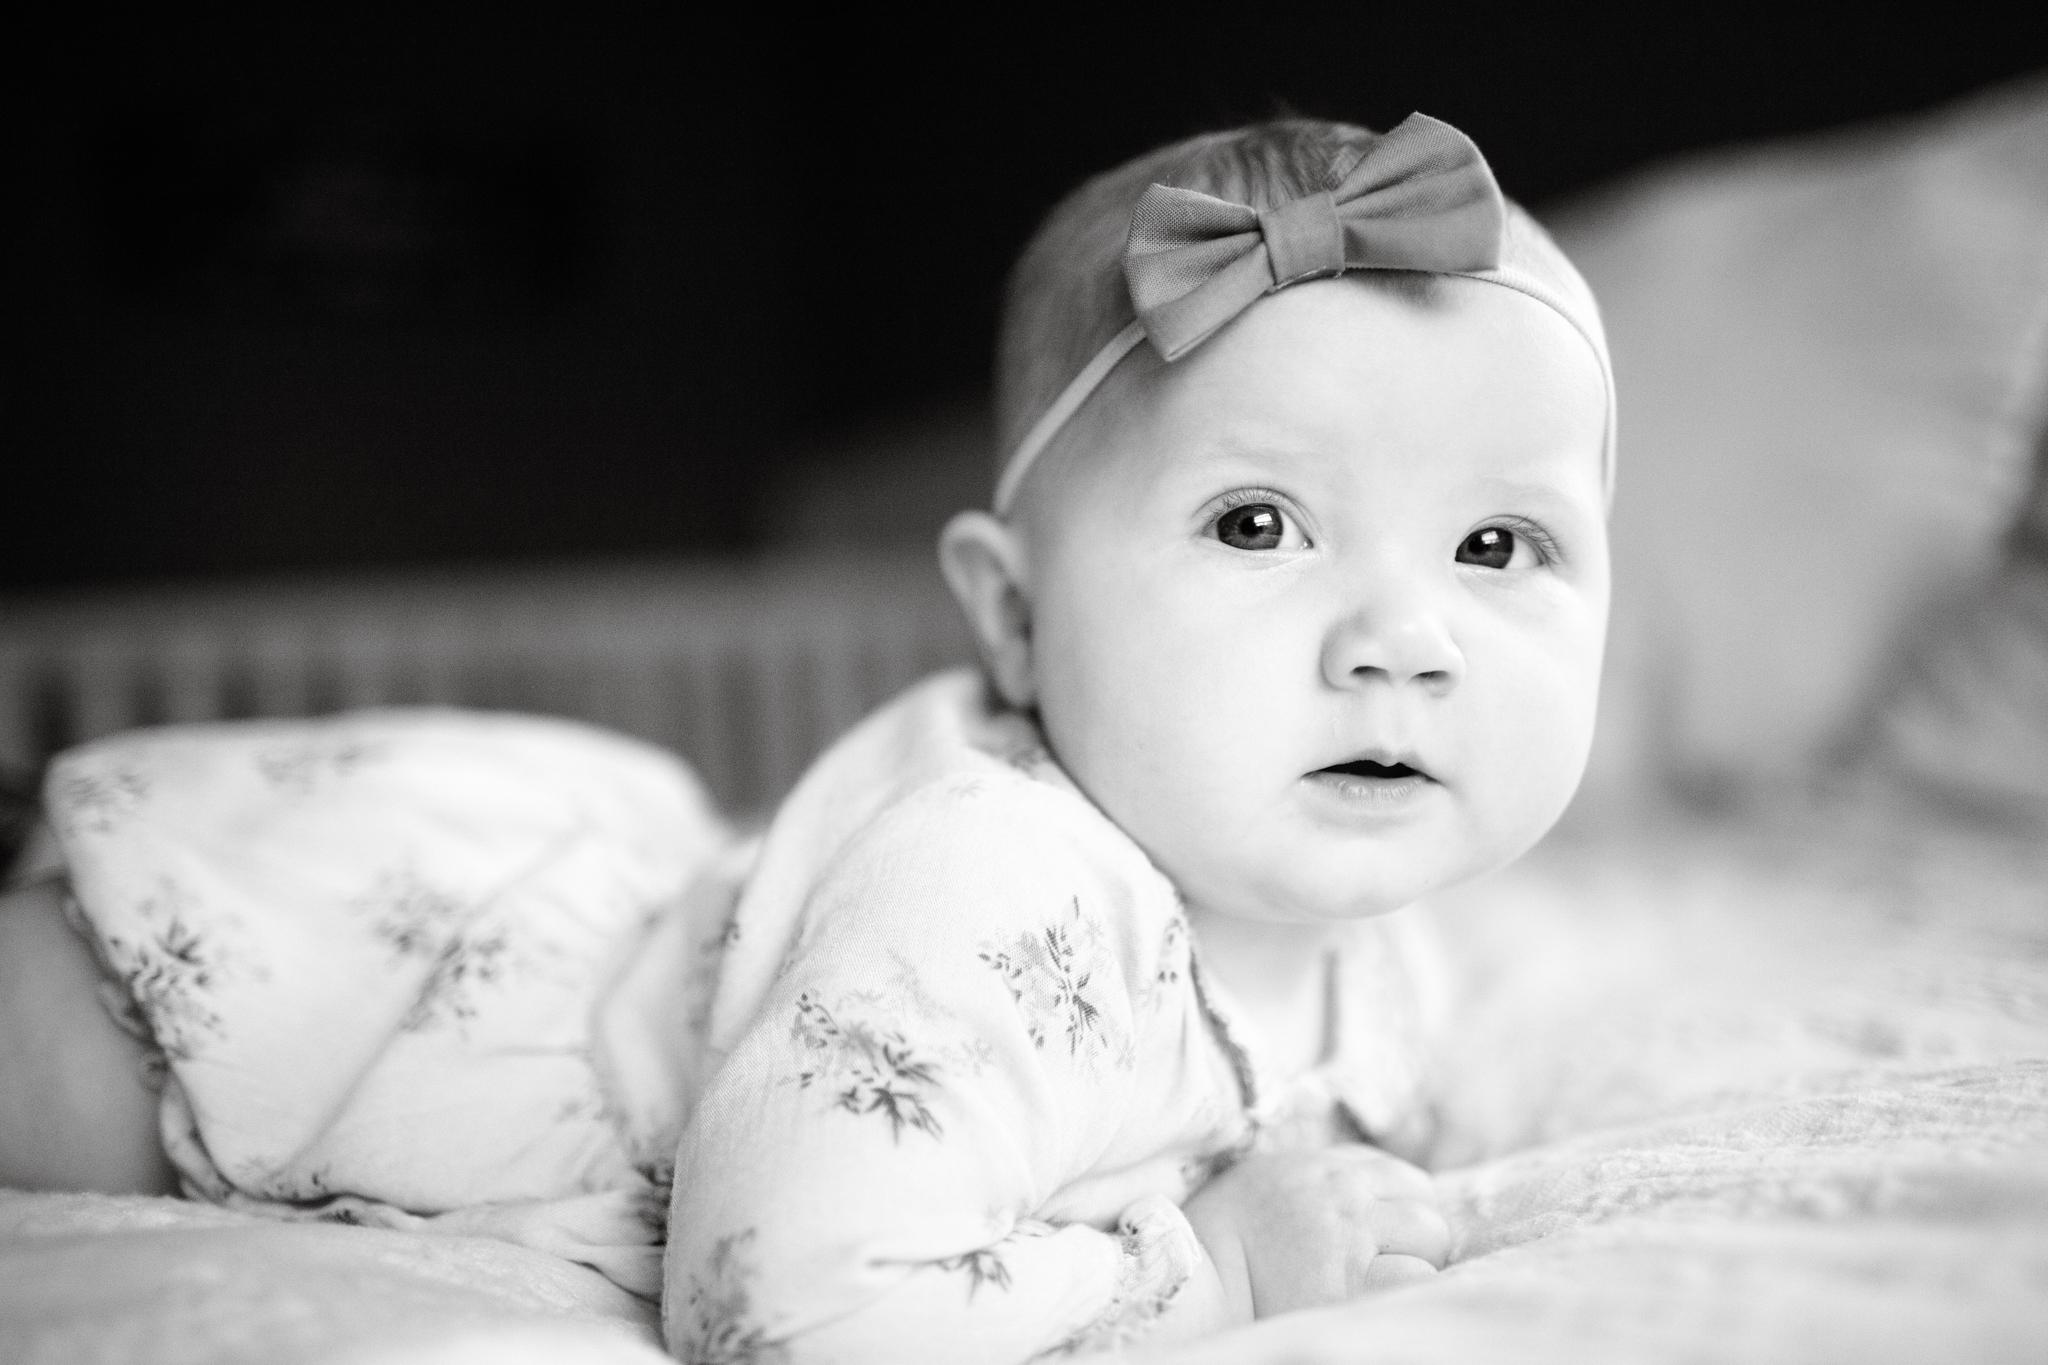 maine-baby-milestone-photographer-stepheney-collins-photography -10.jpg